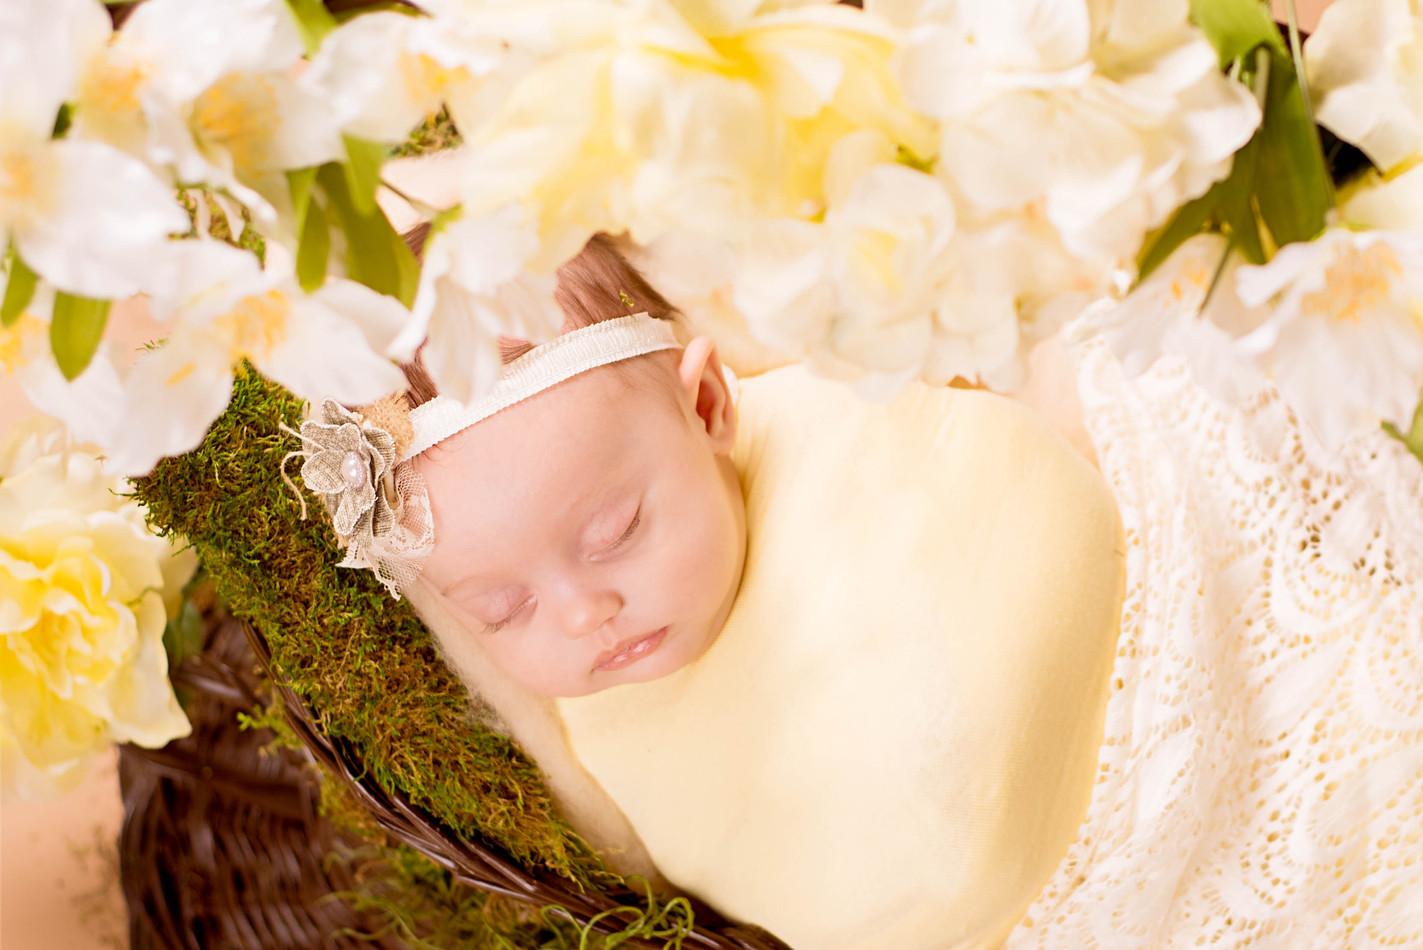 Newborn with yellow flowers